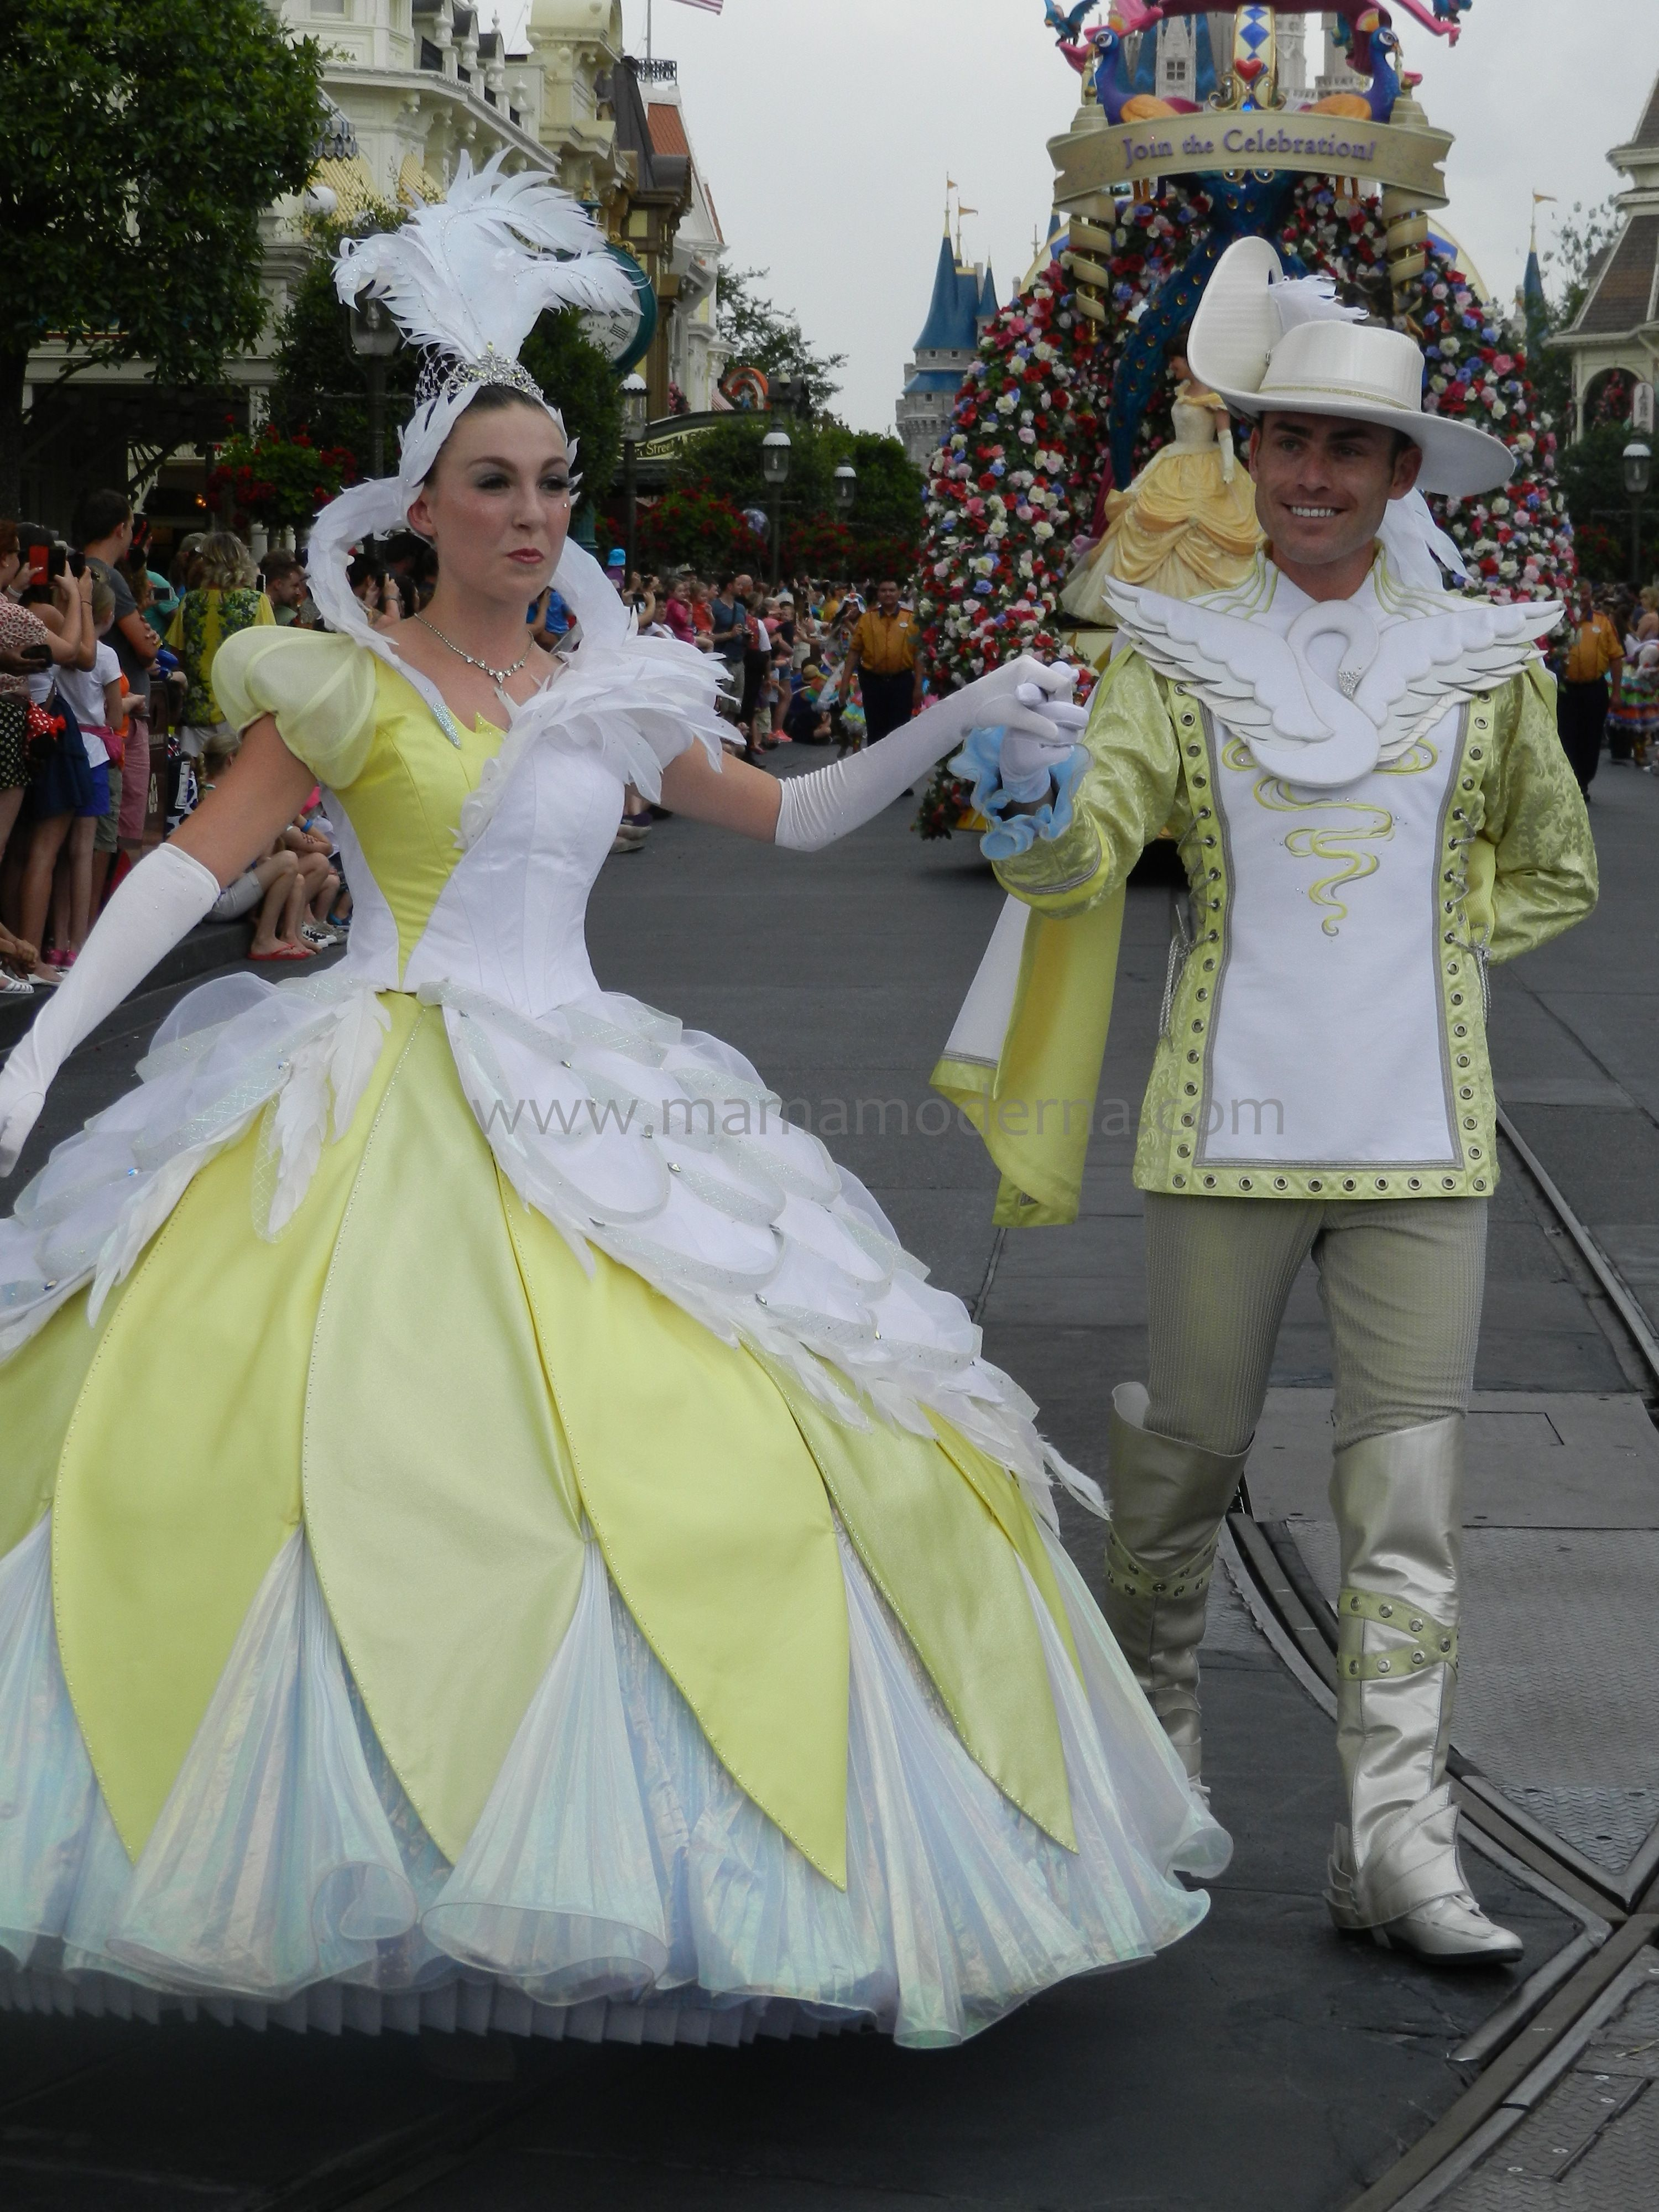 "Vestuario que acompaña la carroza ""Princess Garden"". #Disney Detalle aquí http://mamamoderna.com.mx/2014/06/disney-festival-of-fantasy-parade.html"